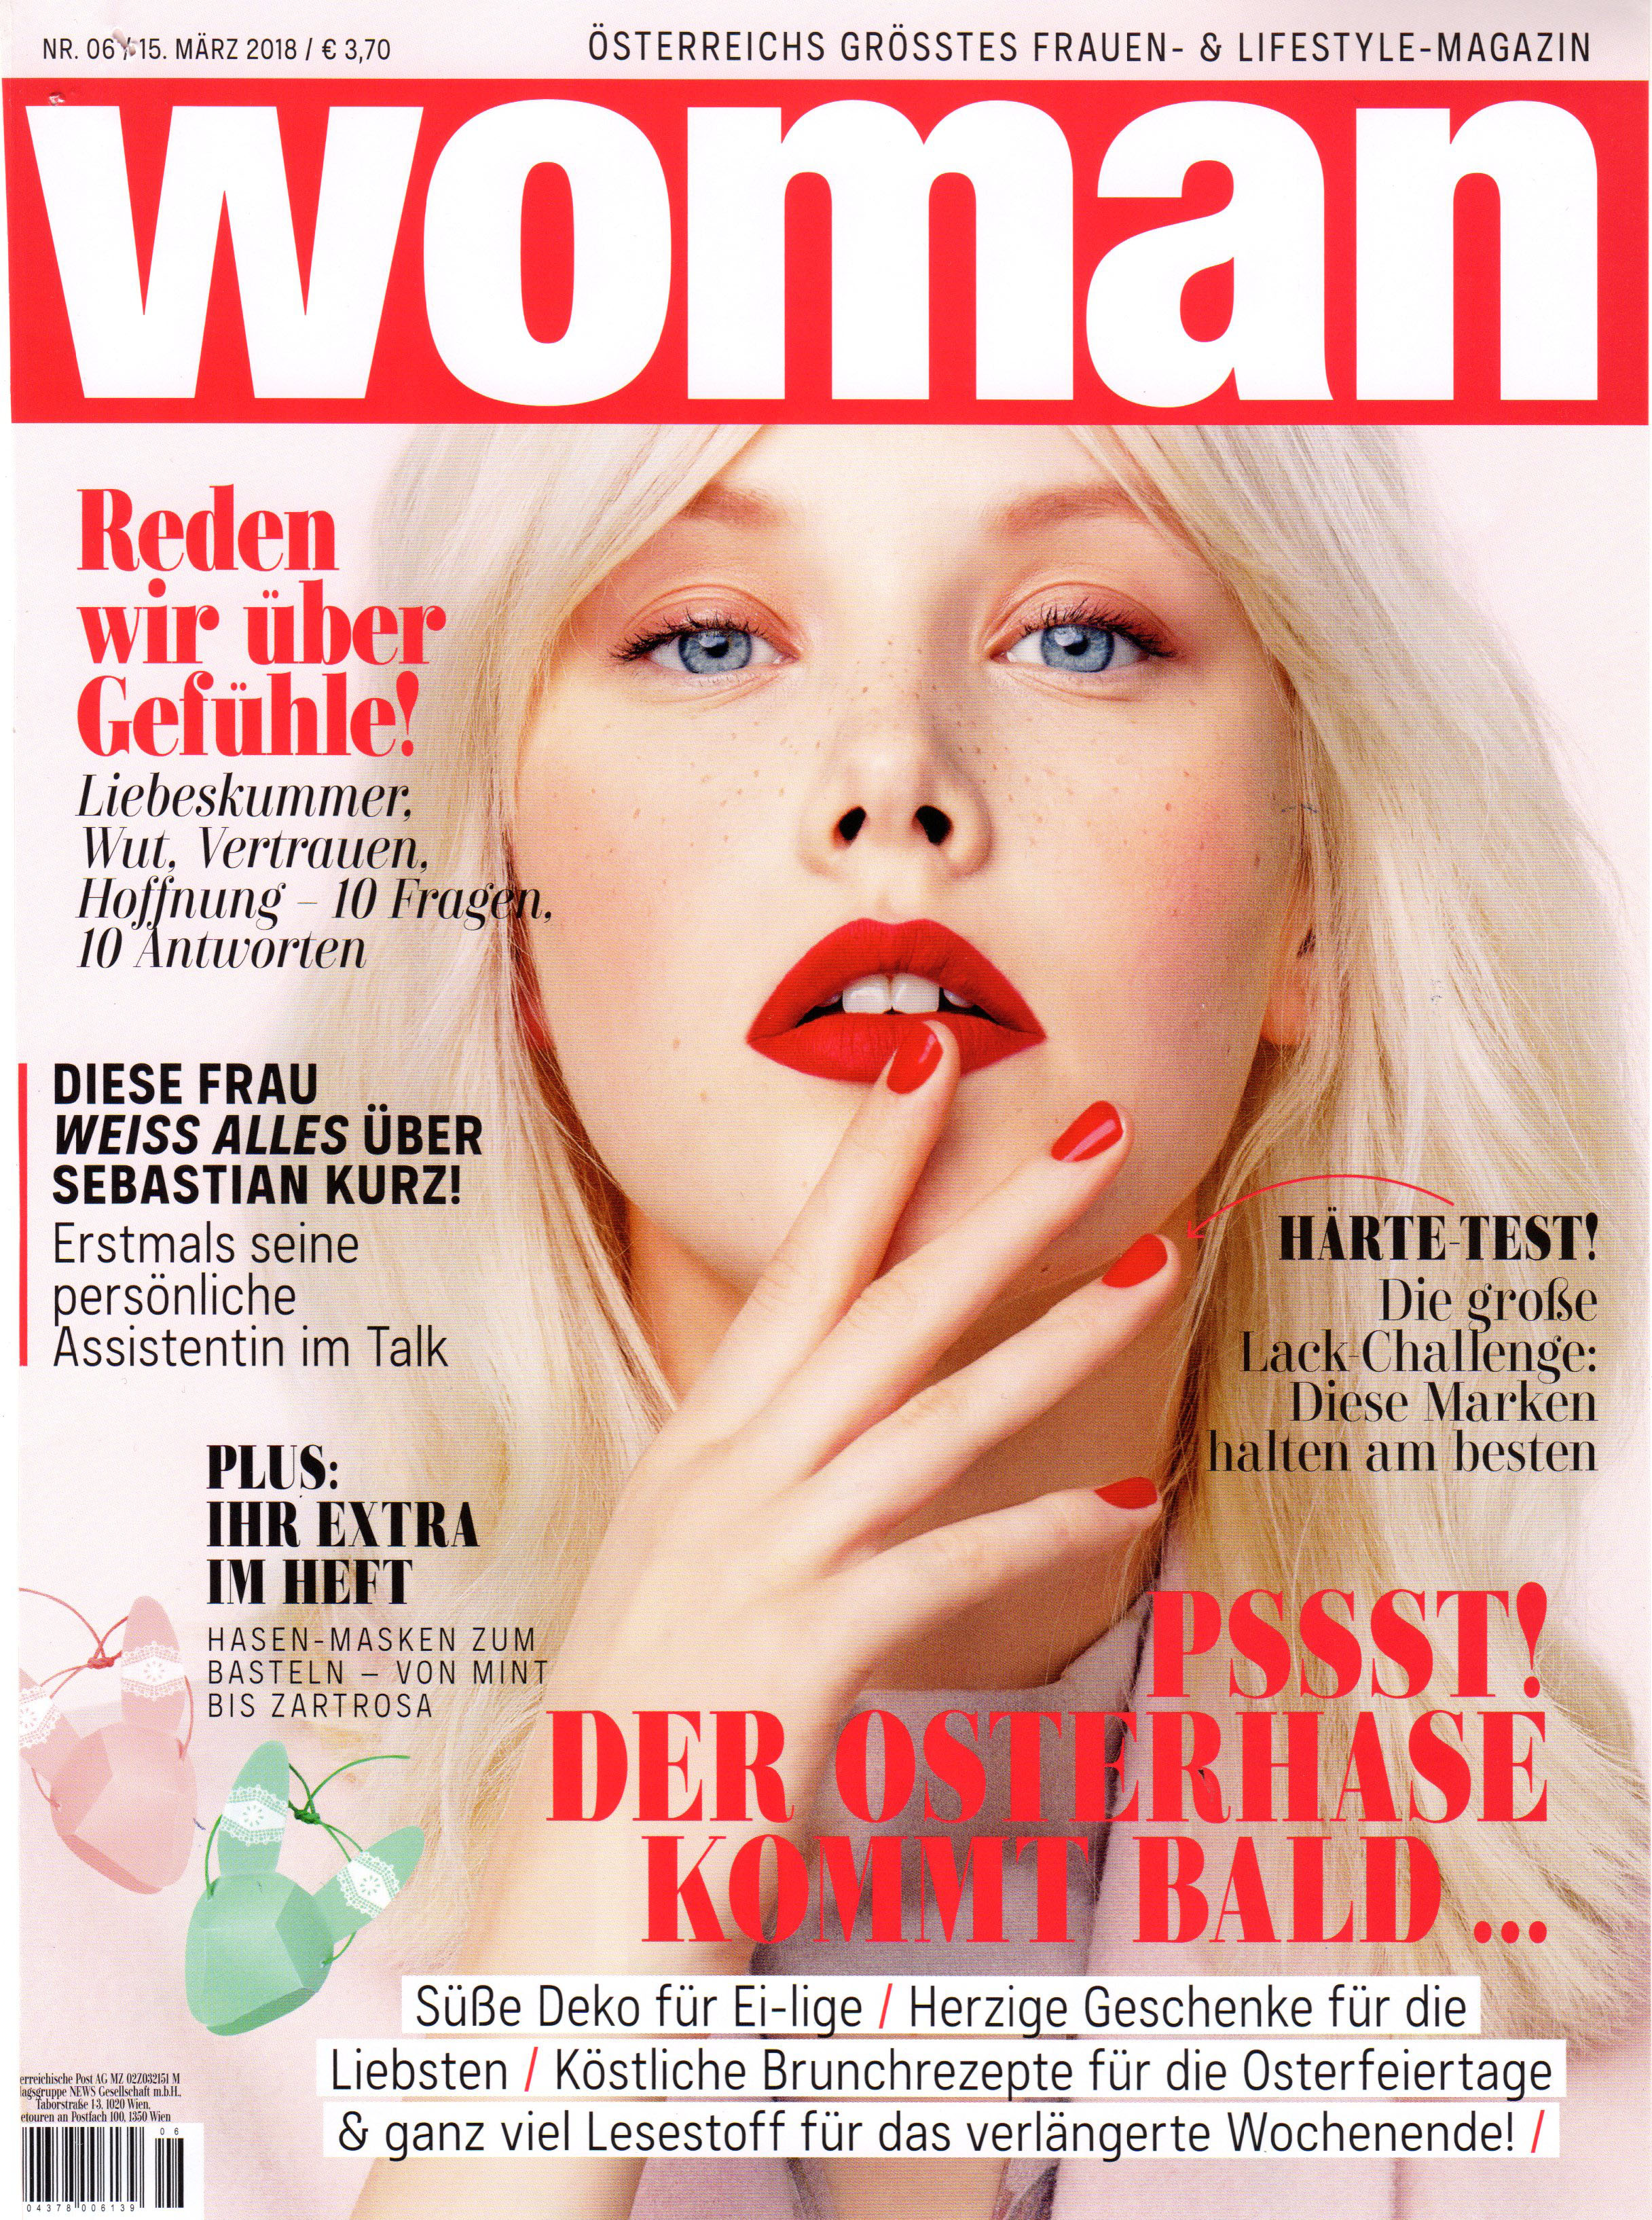 Beruhigend: Rosmarin, Woman im März 2018